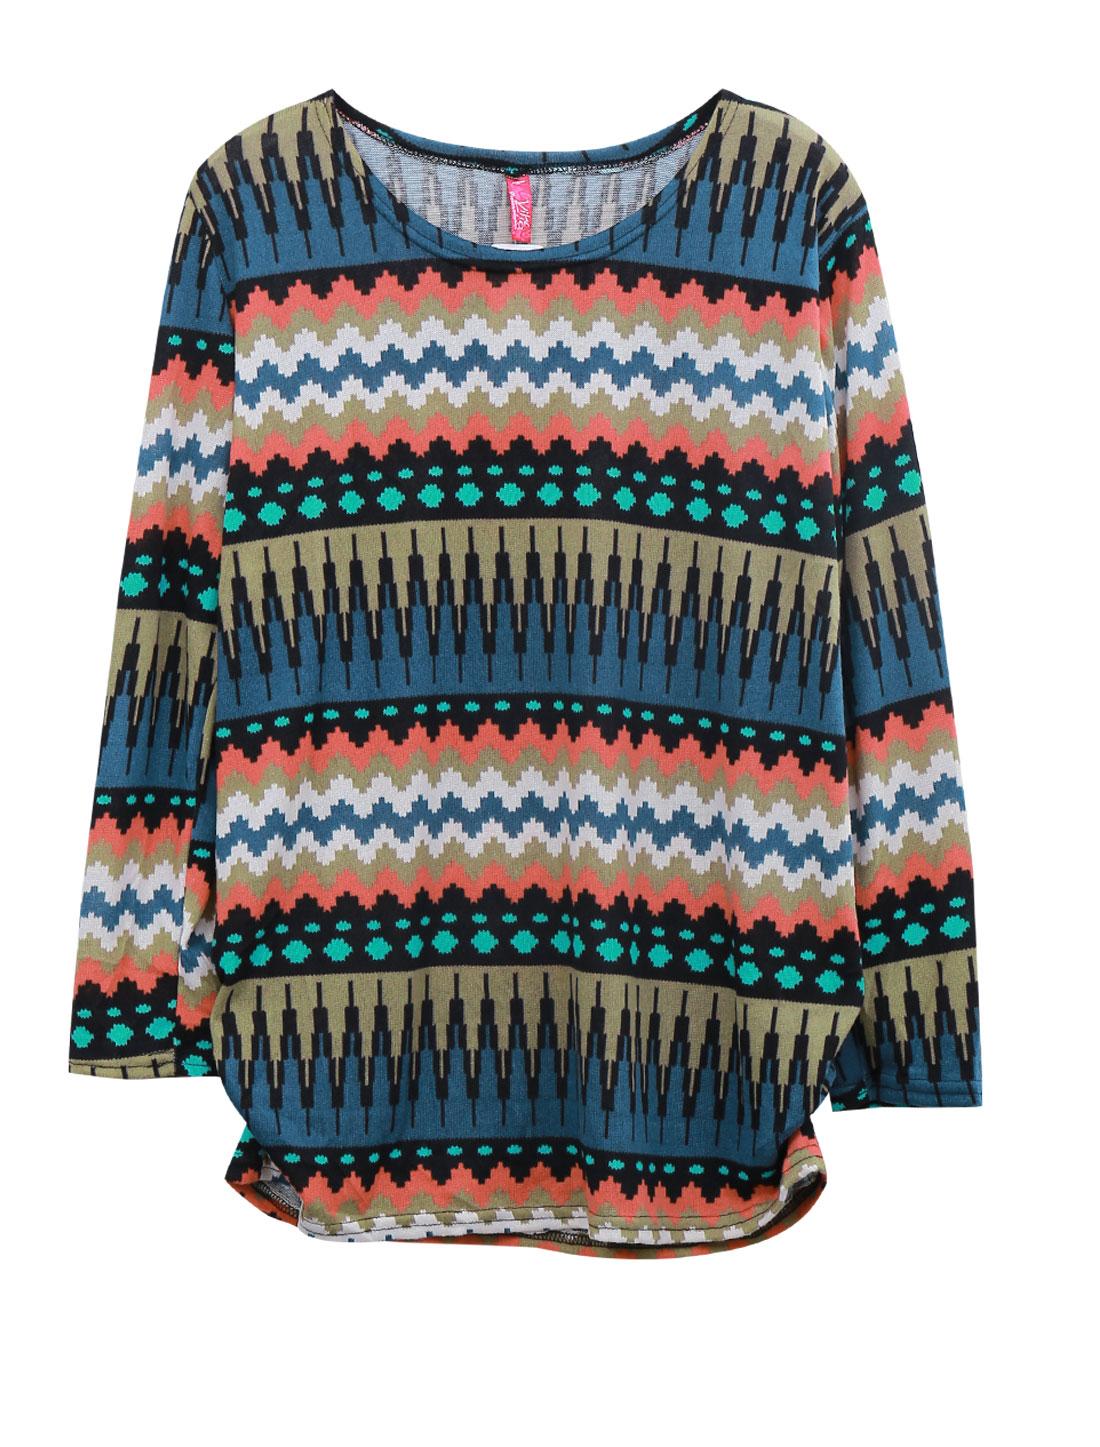 Women Zig-Zag Novelty Pattern Round Neck Tunic Knit Shirt Multicolor S